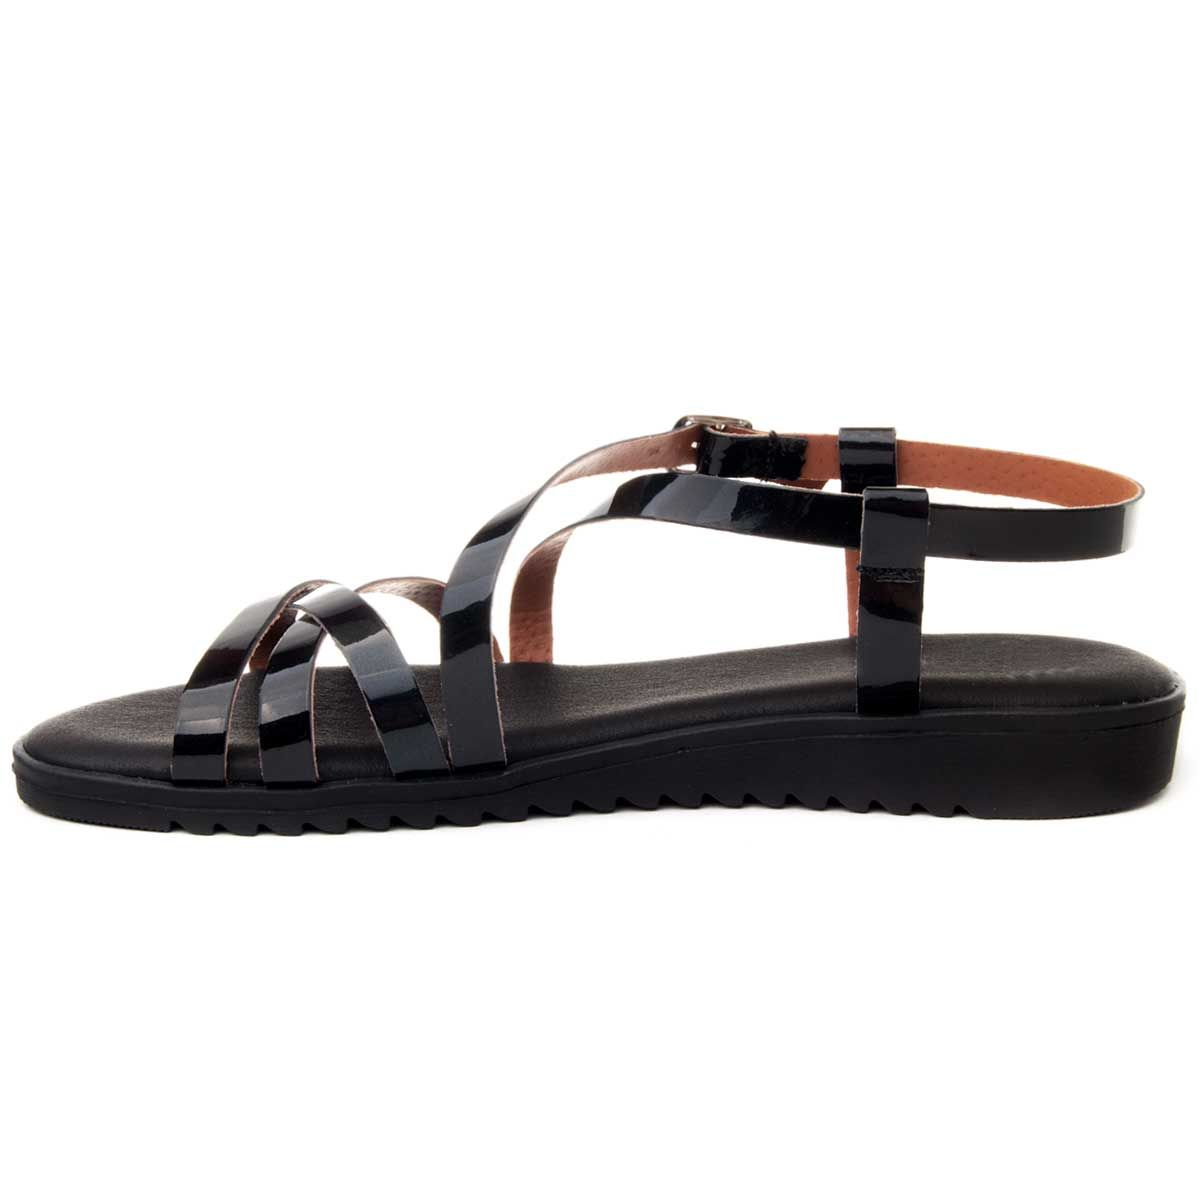 Purapiel Flat Gladiator Sandal in Black